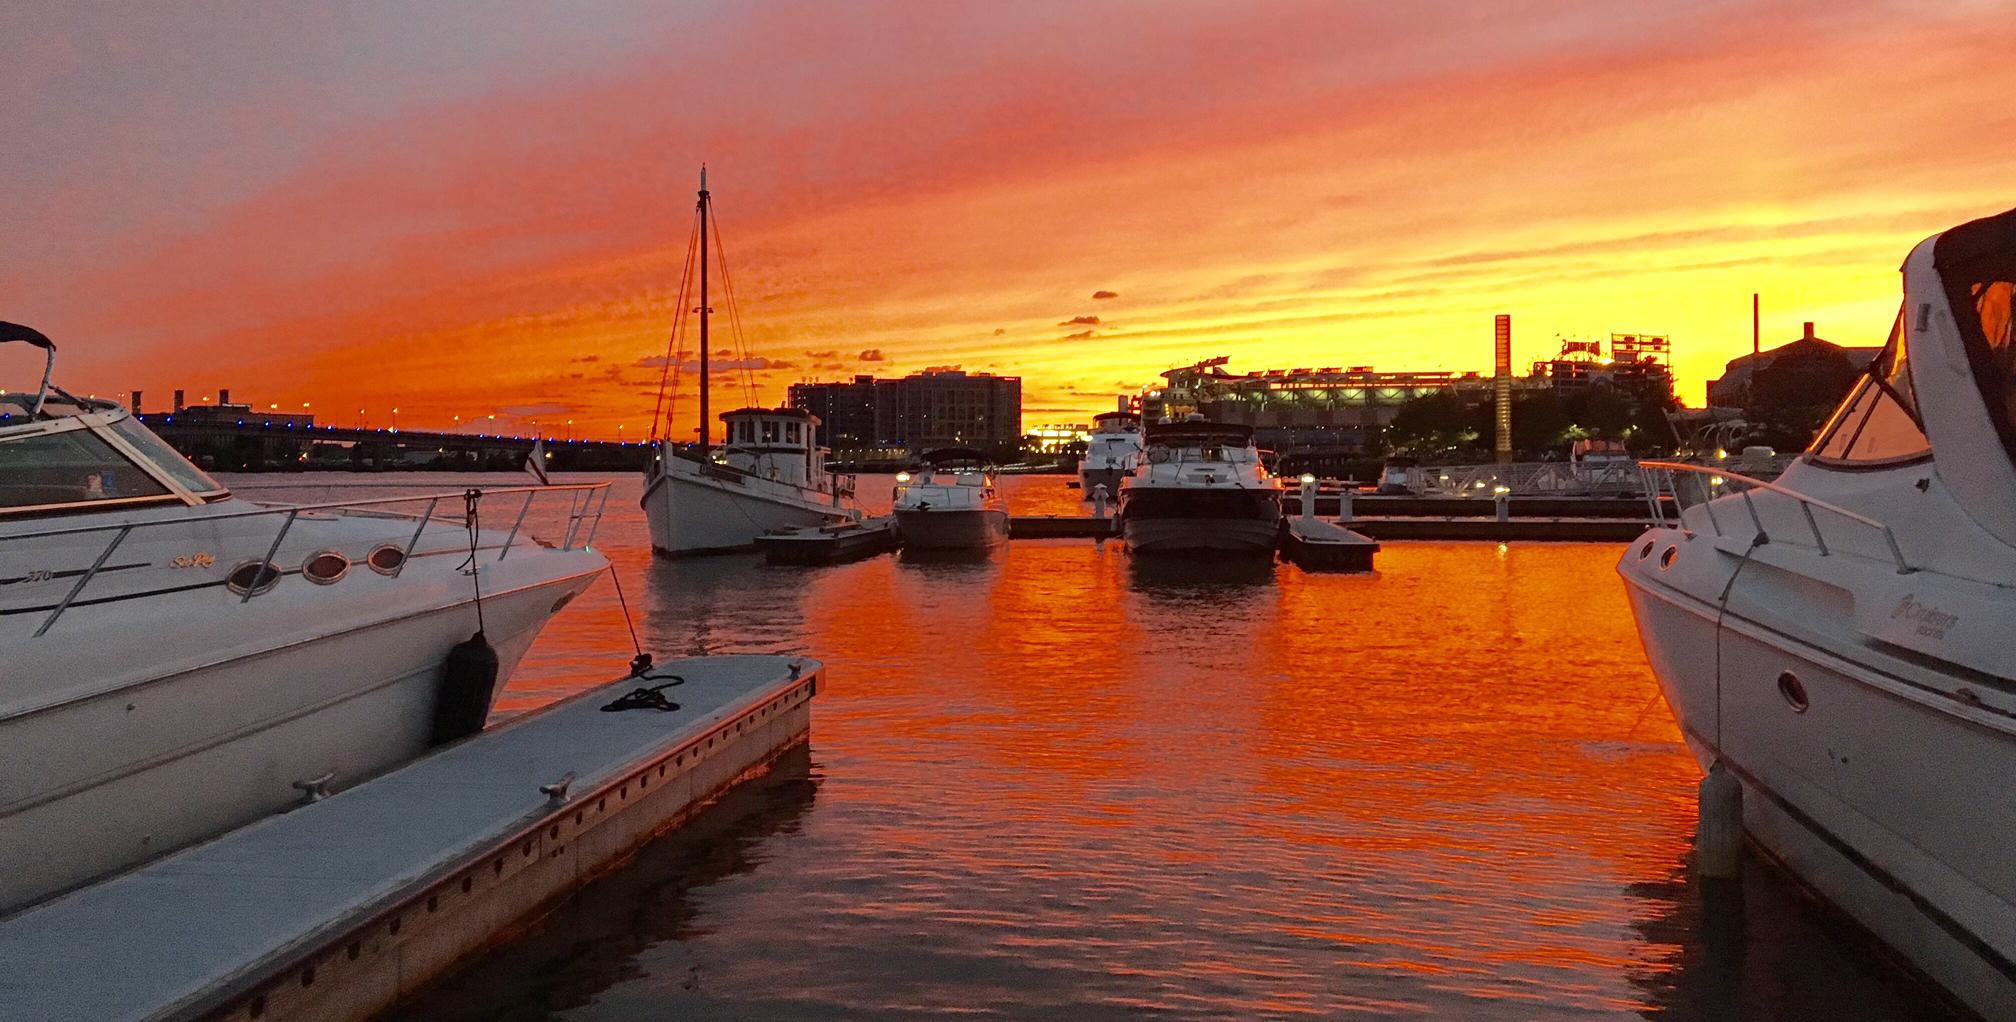 yards-marina-at-sunset1